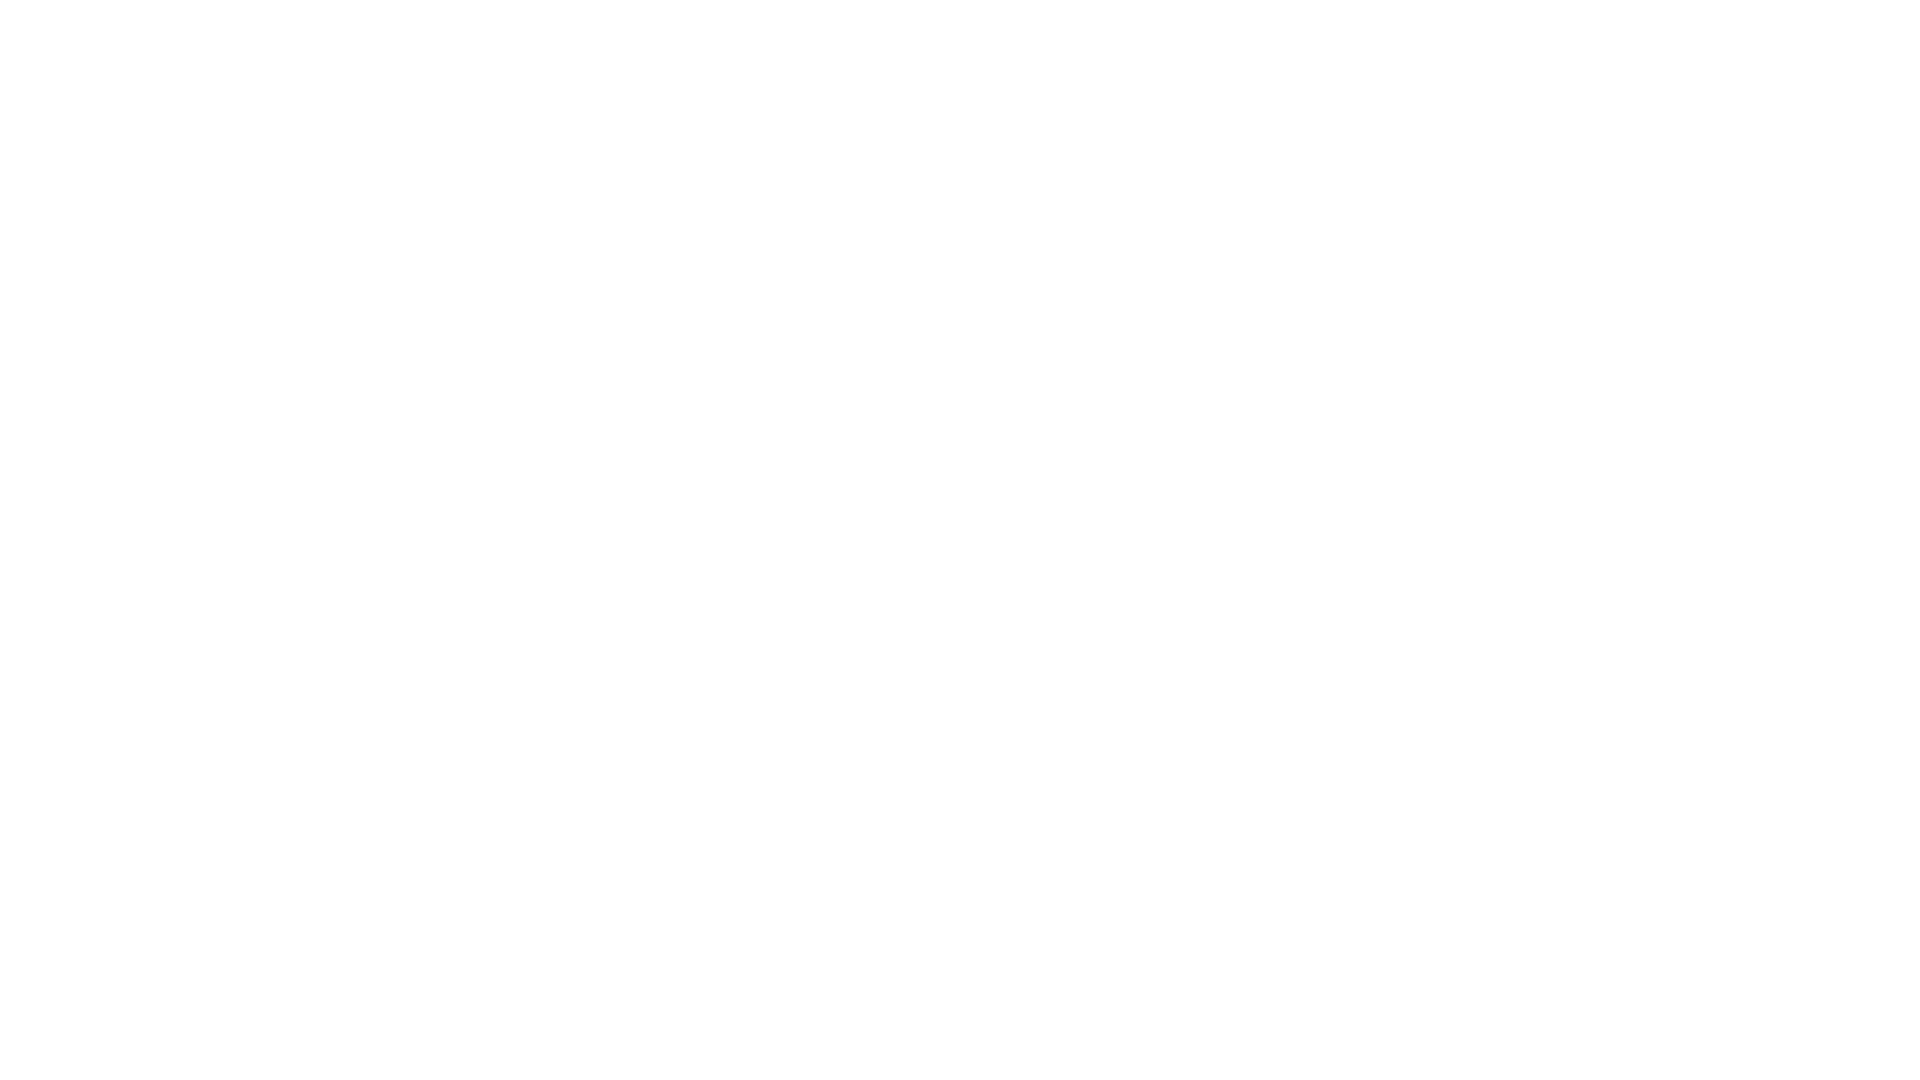 YM DESiGN